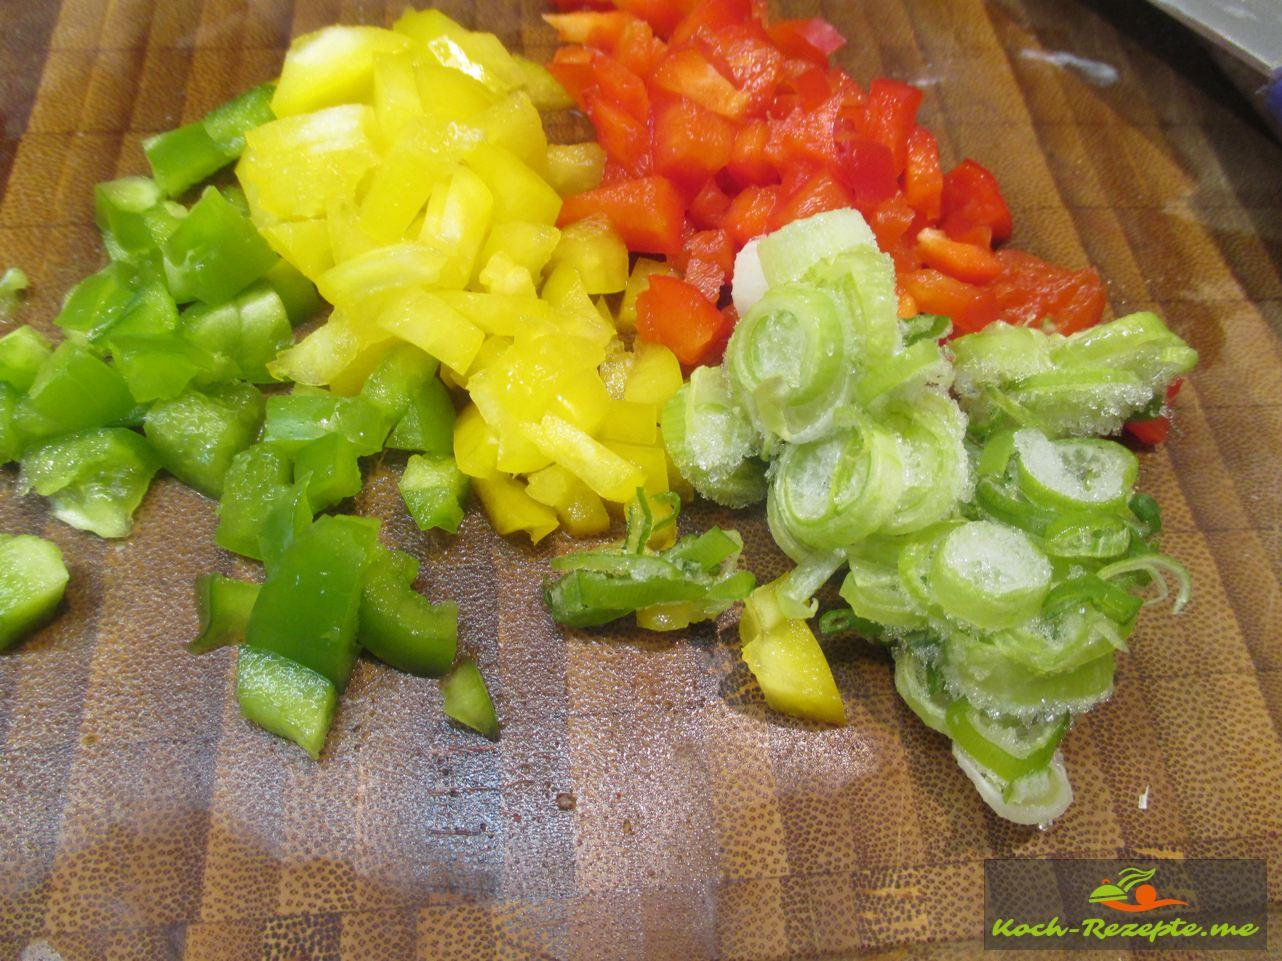 Frühjahrs Rüben Rezept, Paprika in Würfel schneiden so auch Porree oder Frühlingszwiebel